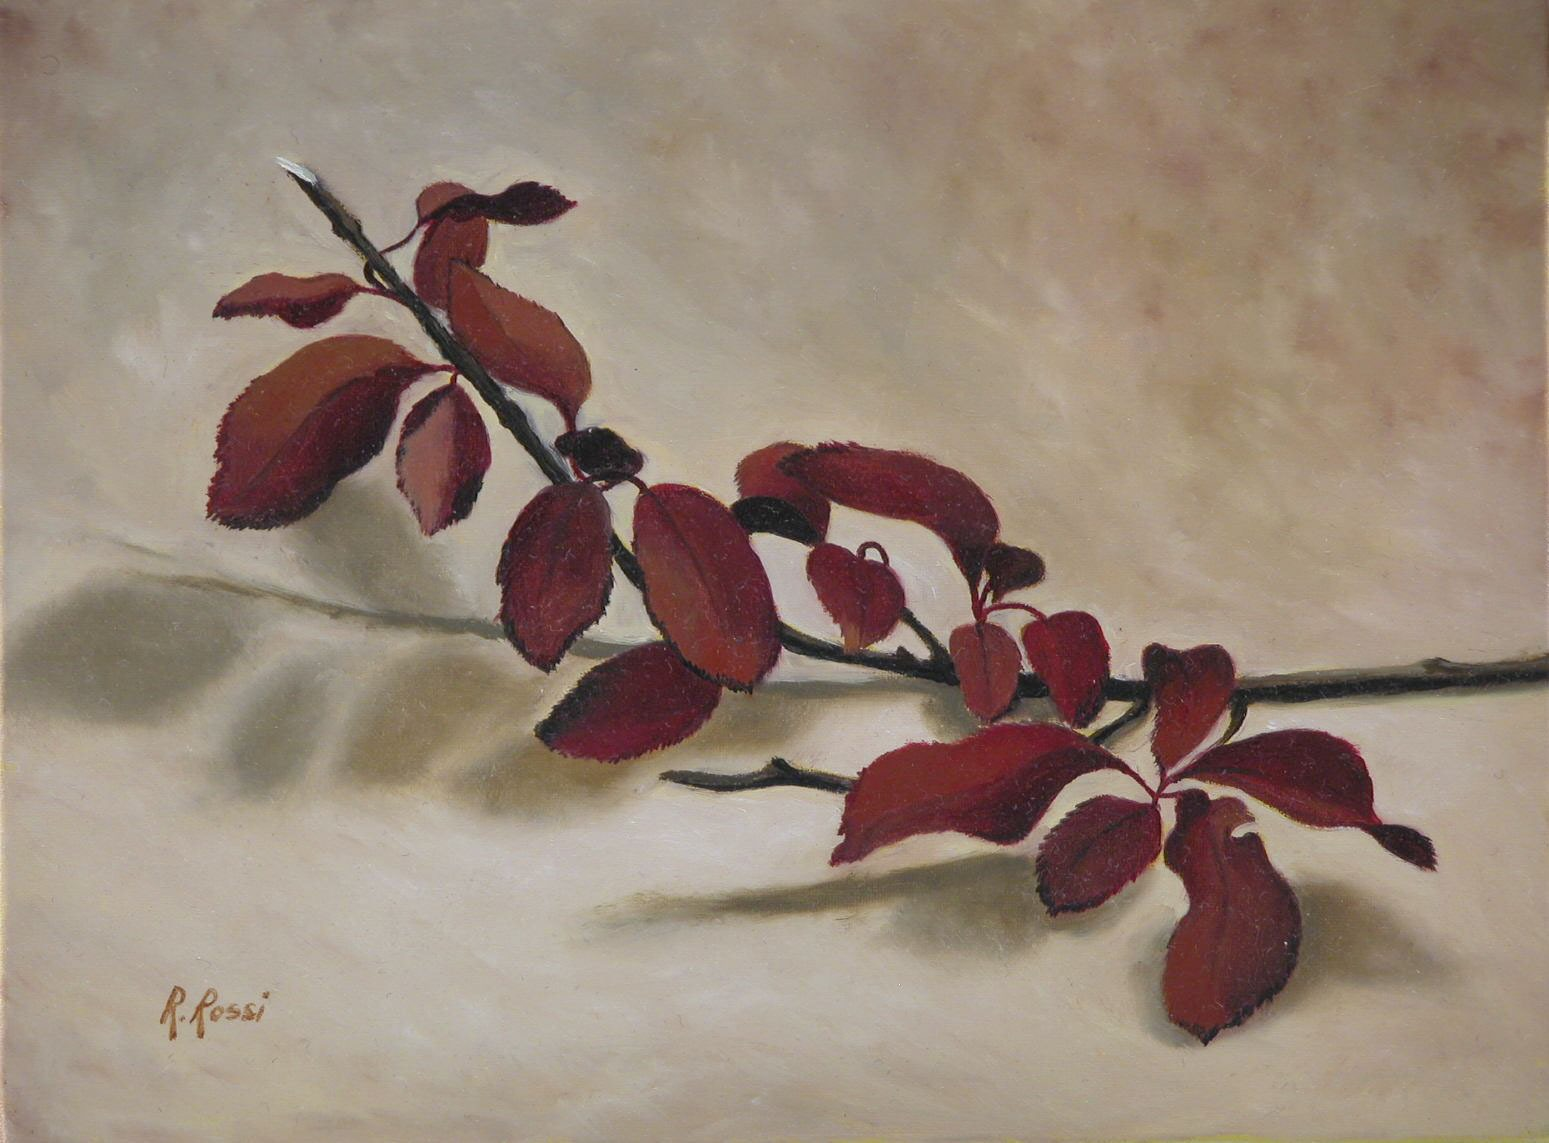 2008 roberta rossi - Rametto - olio su tela - 18 x 24